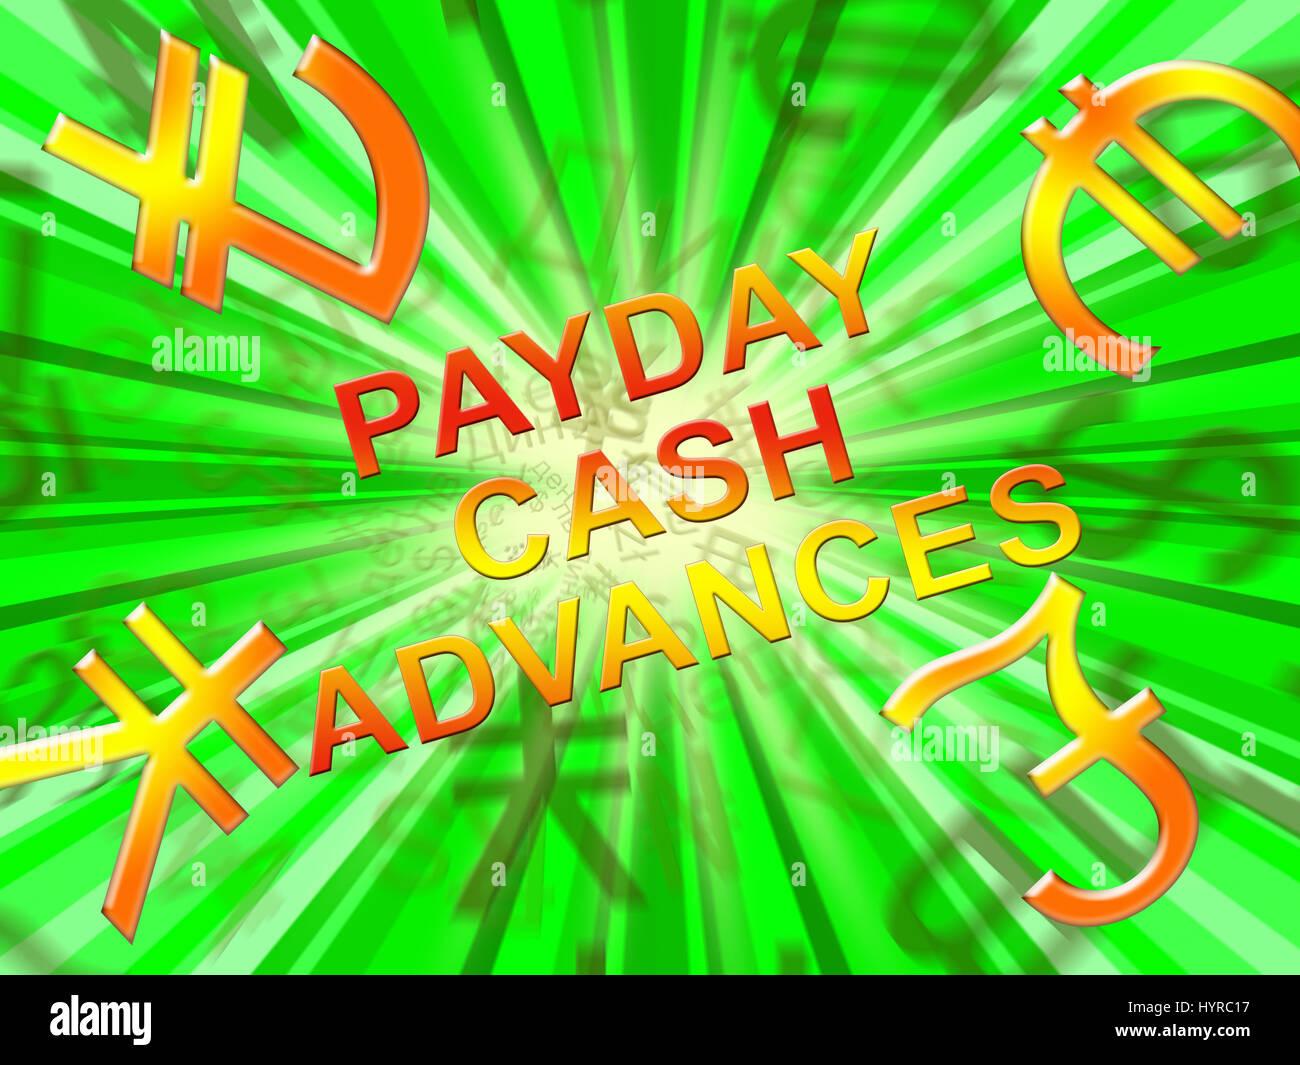 Cash advance manteca photo 1